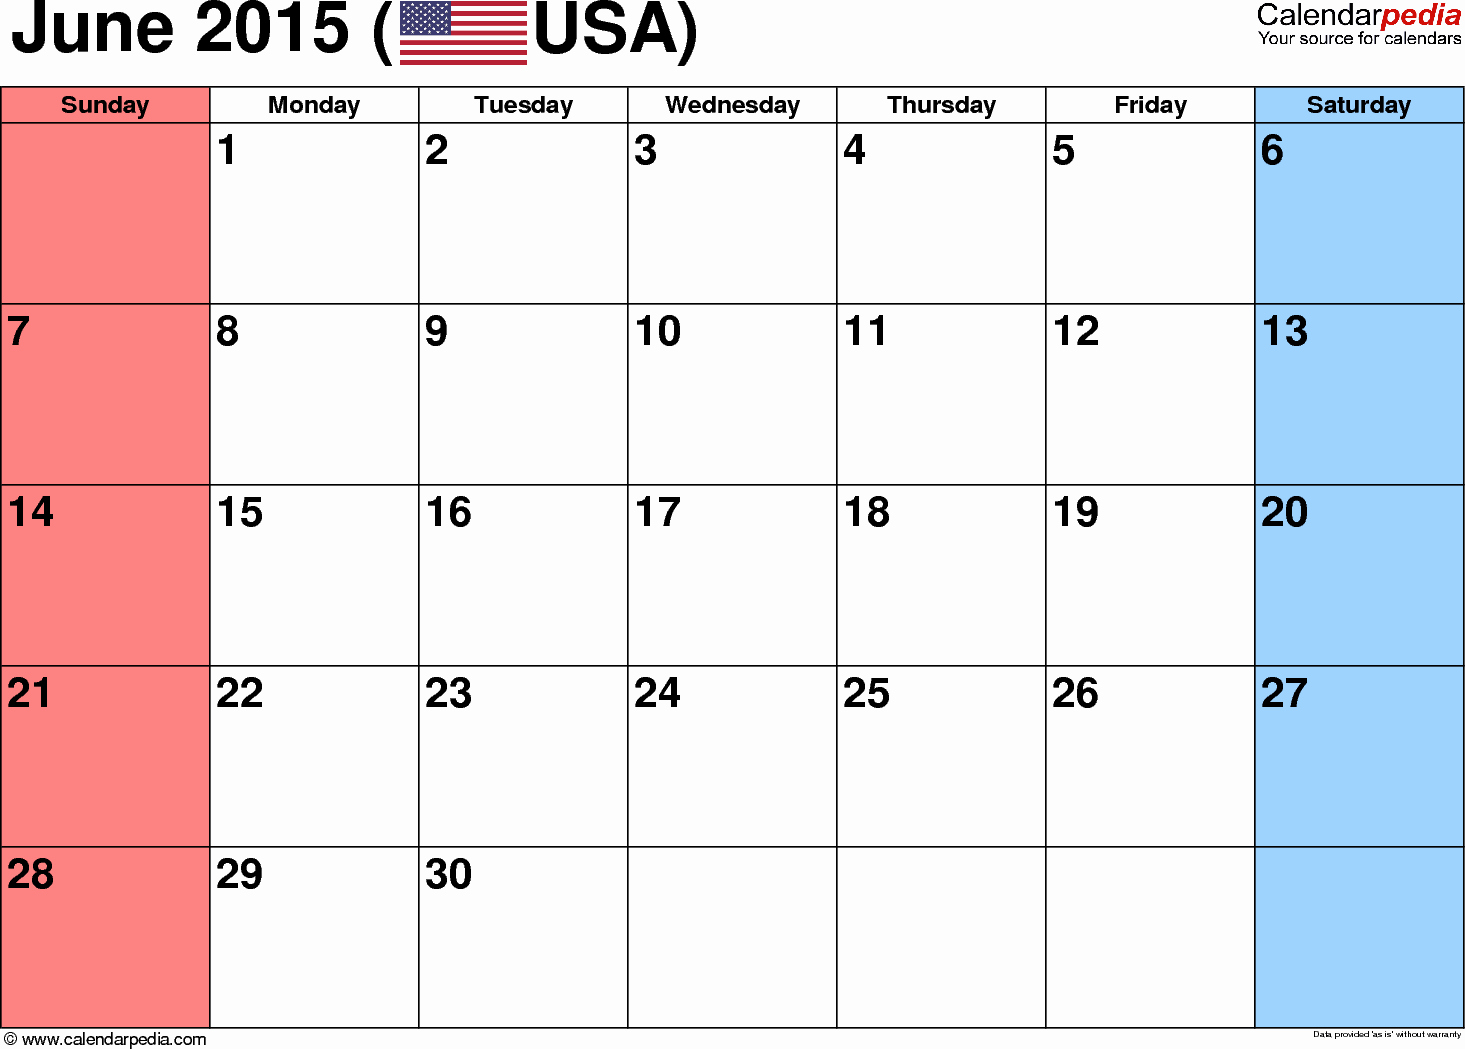 Calendar Template for June 2015 Unique June 2015 Calendars for Word Excel & Pdf